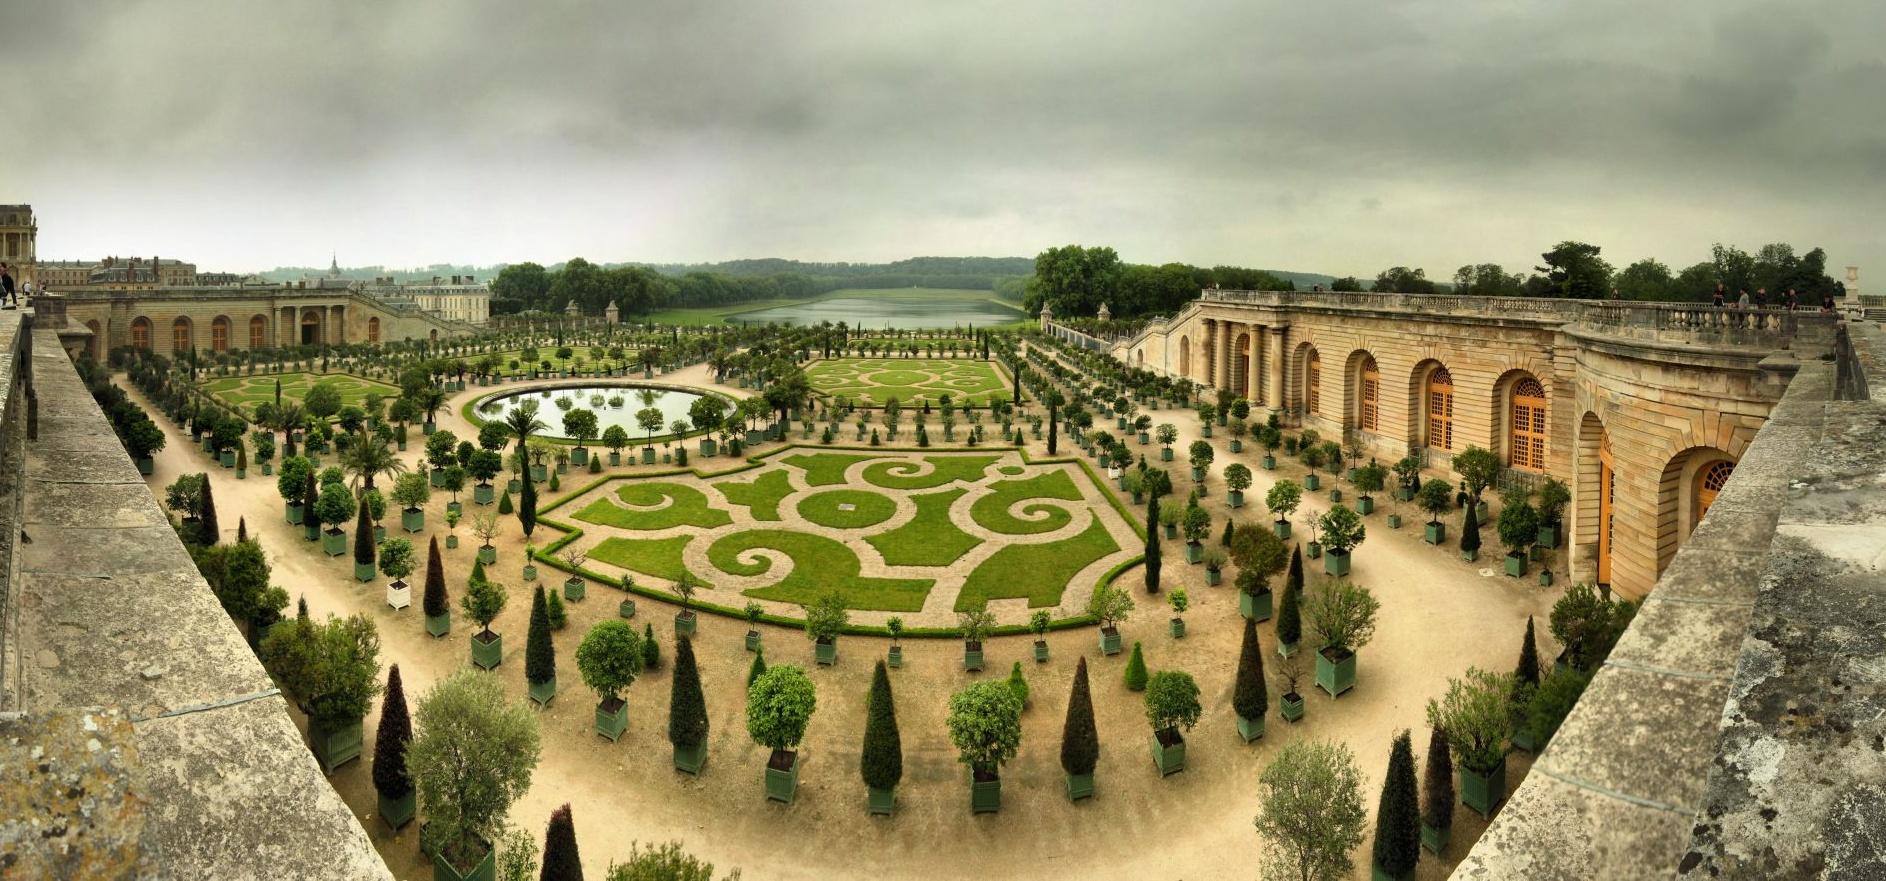 Château de Versailles, autor:  Panoramas